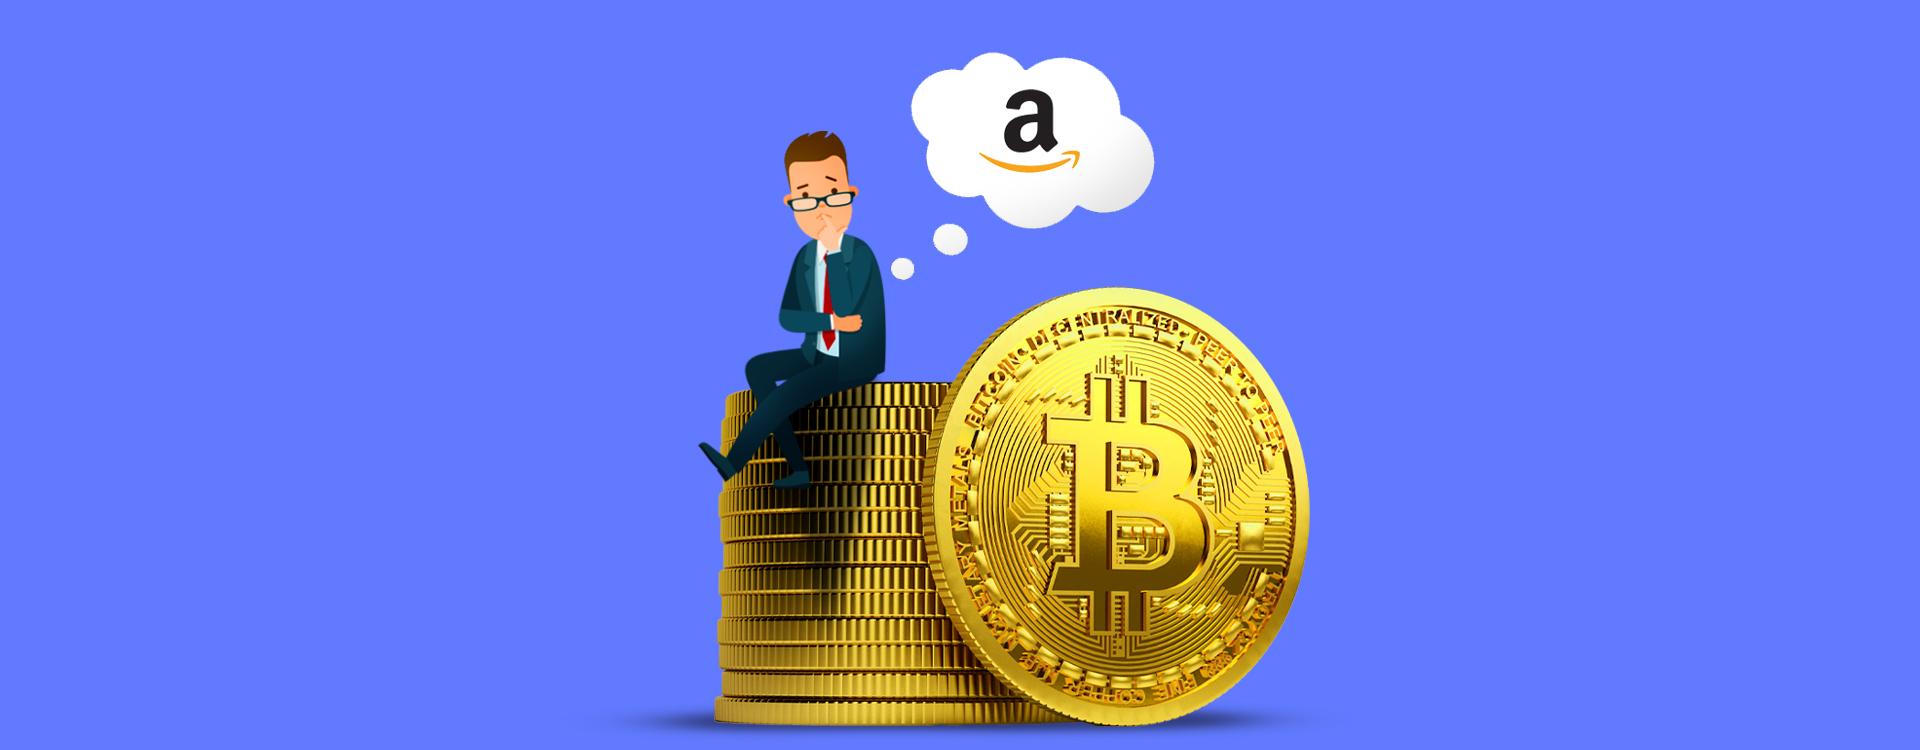 Amazon Bitcoin Cryptocurrency payment method India